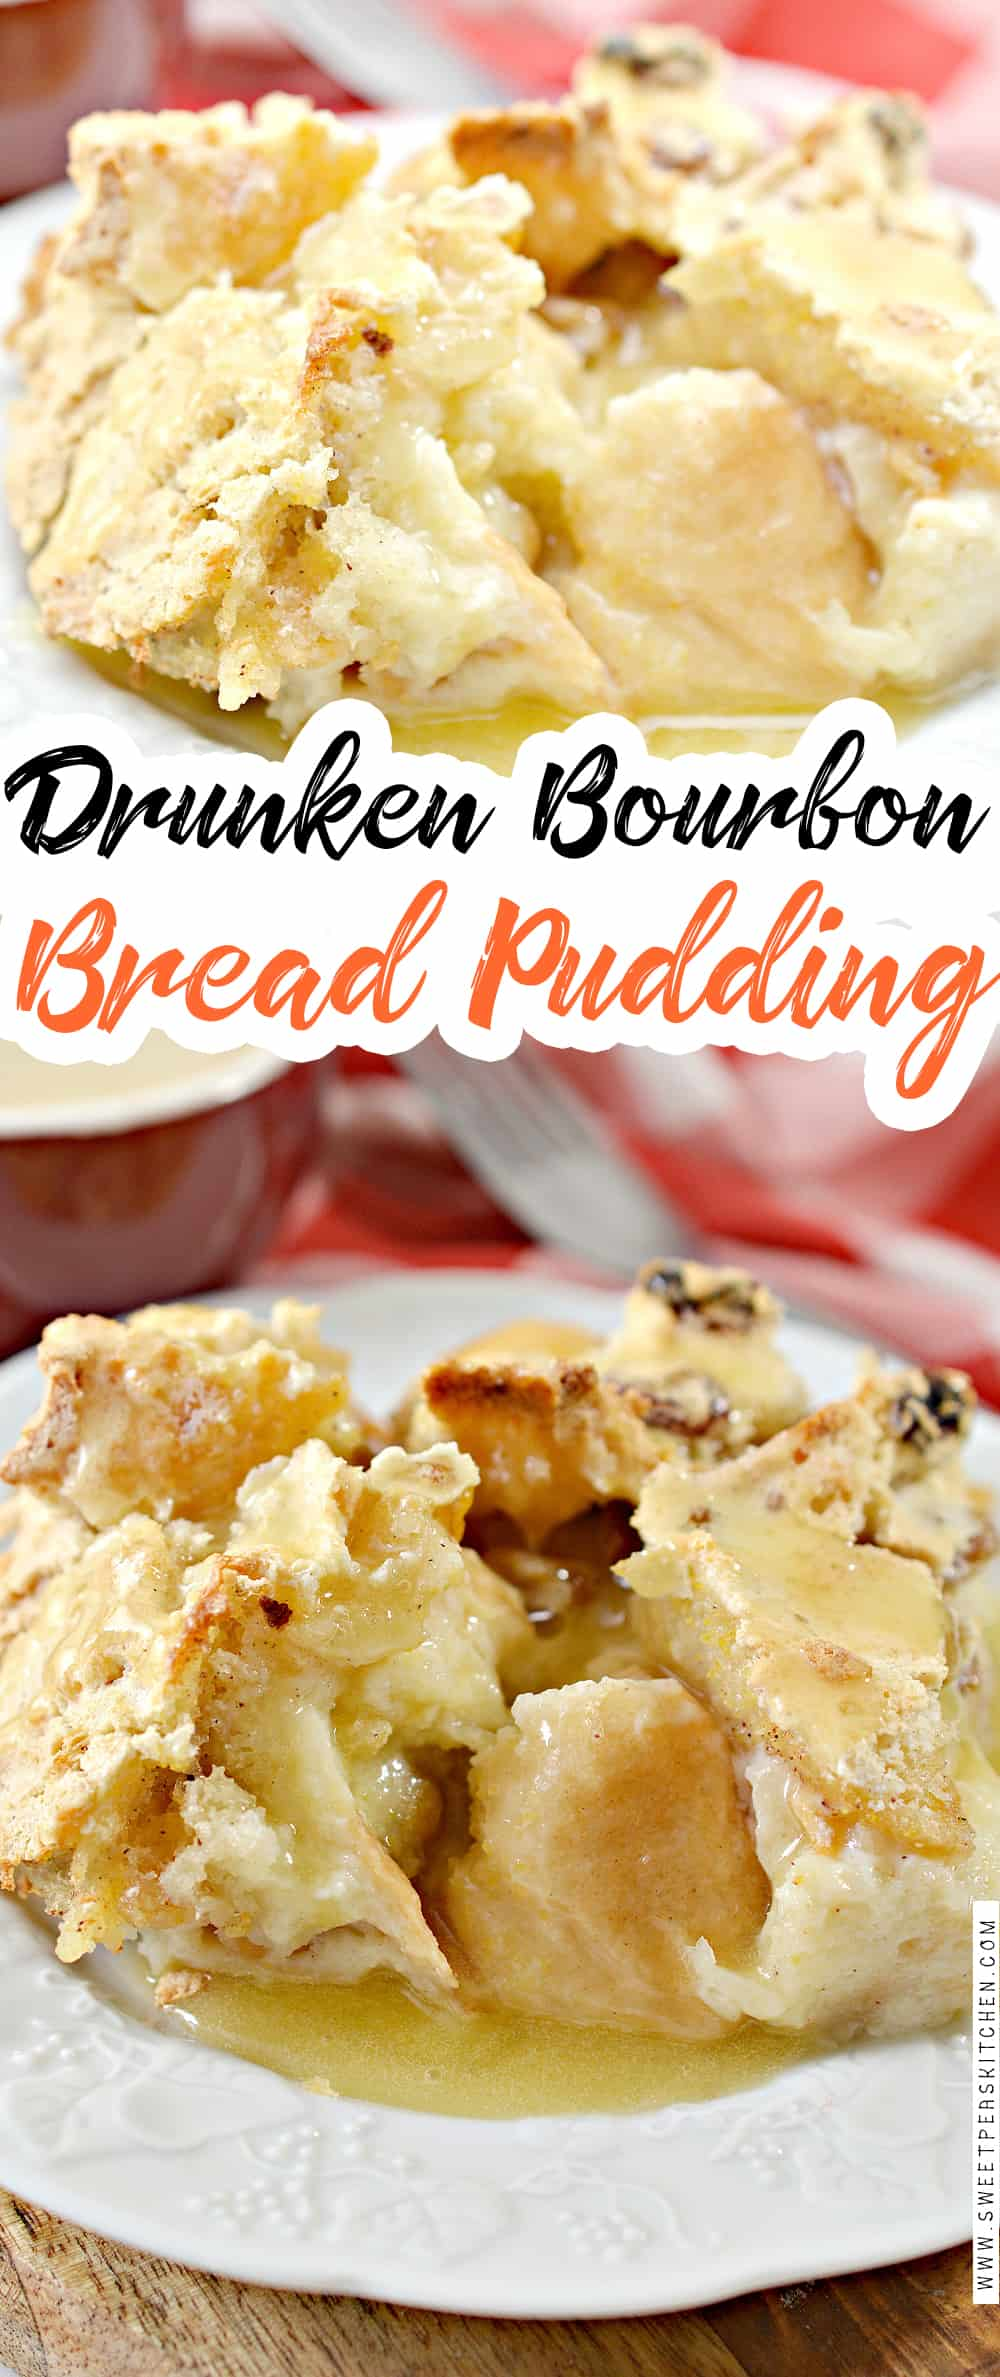 Drunken Bourbon Bread Pudding